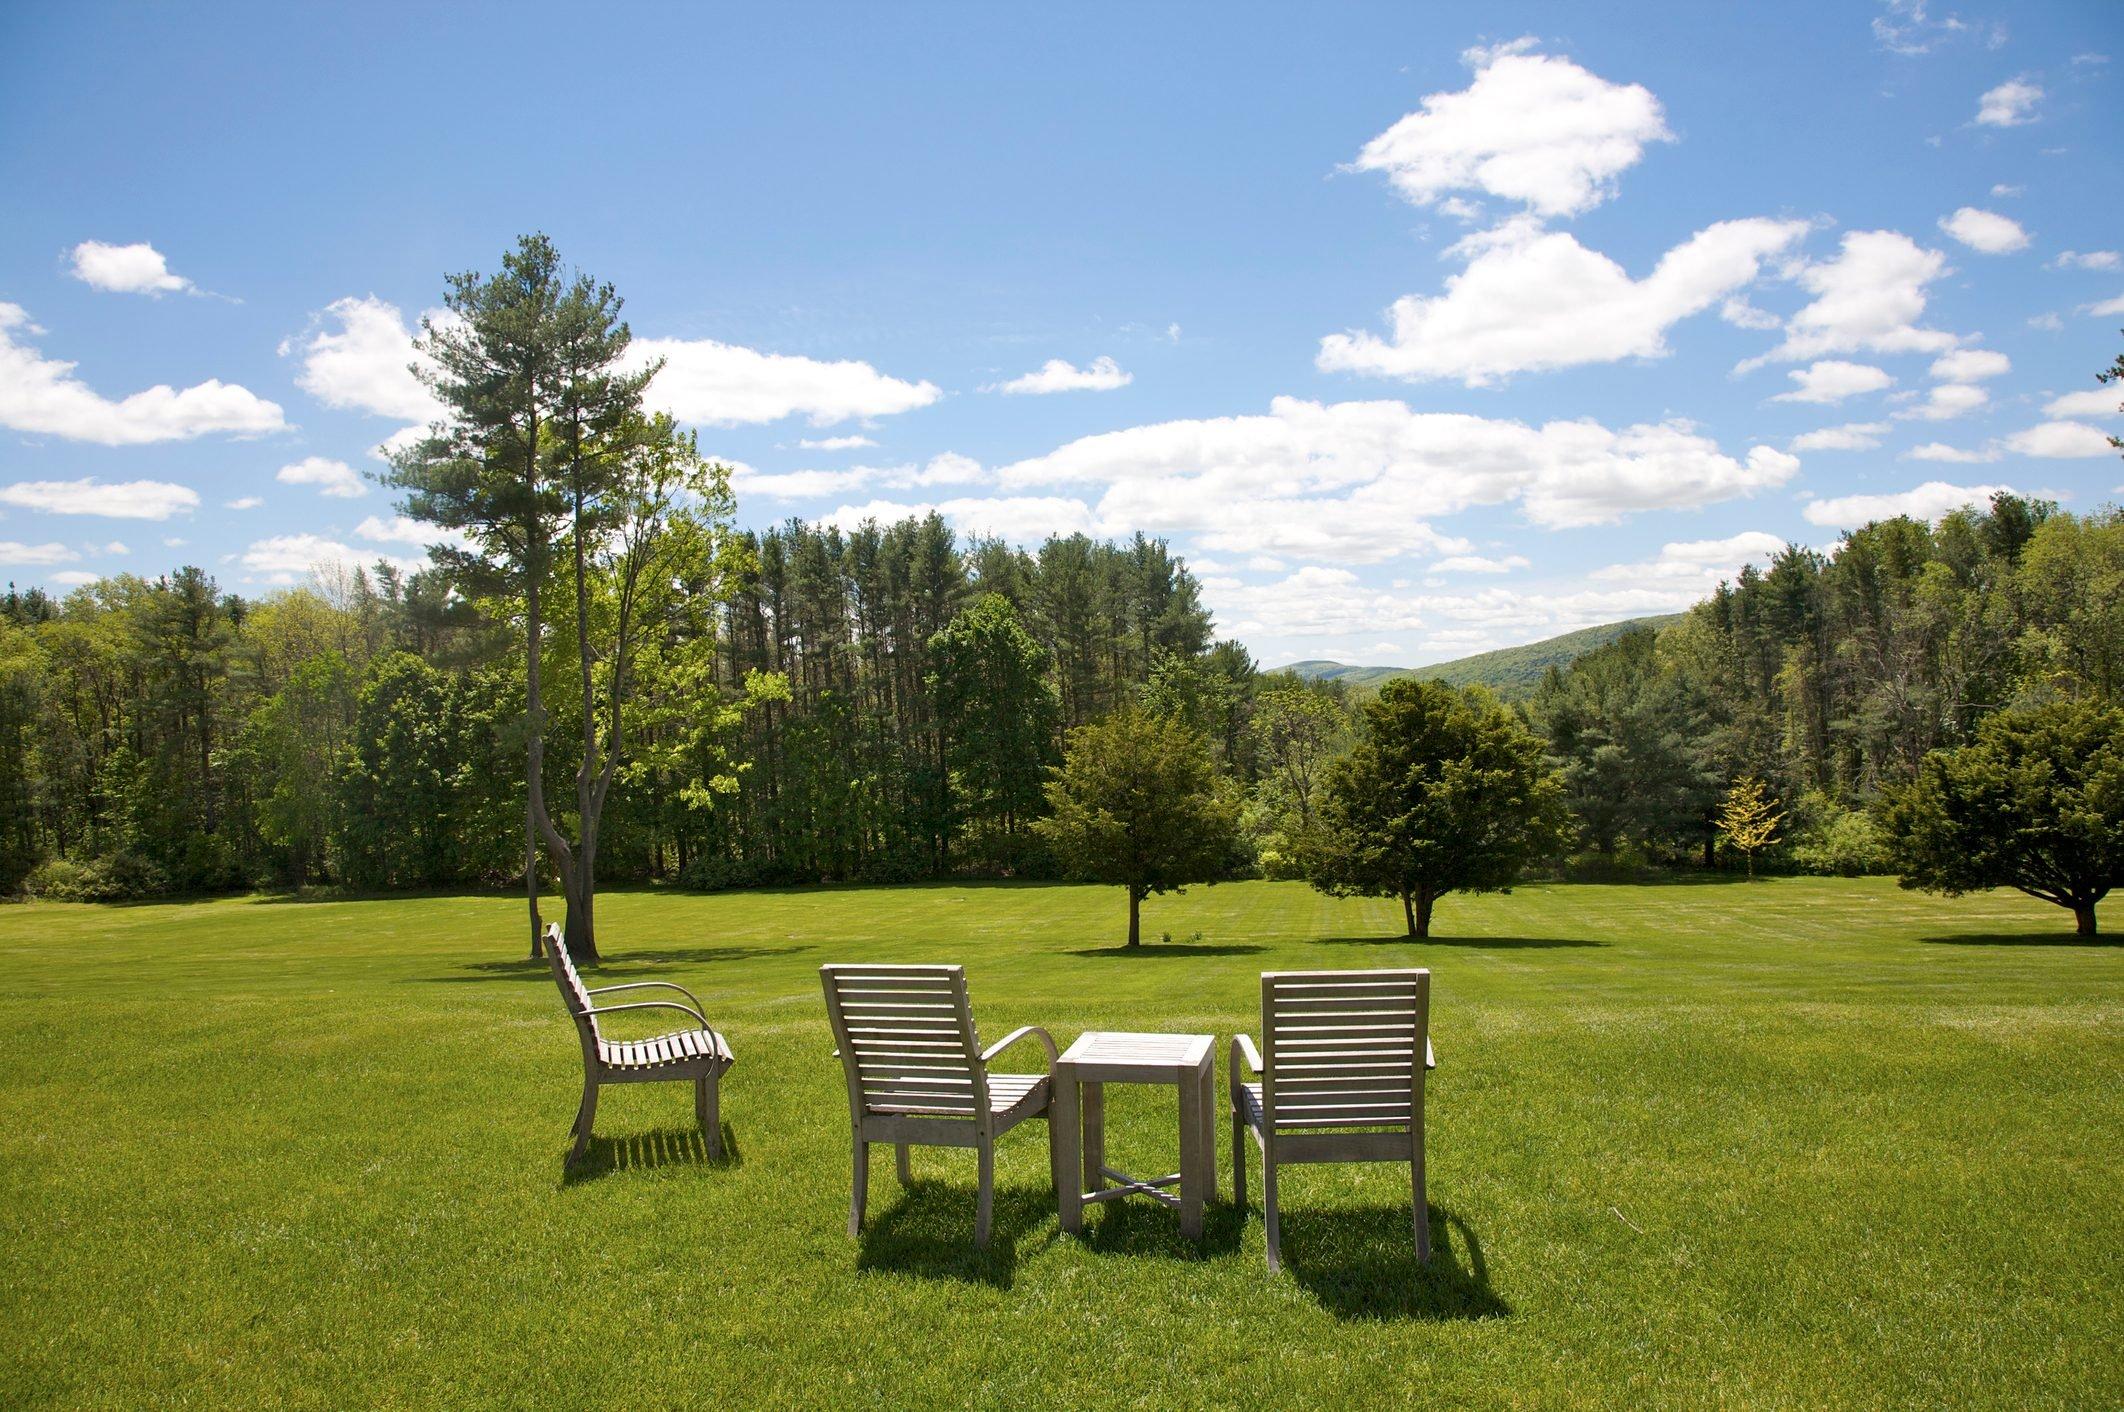 Lawn at Wheatleigh, Lenox, The Berkshires, Massachusetts, USA